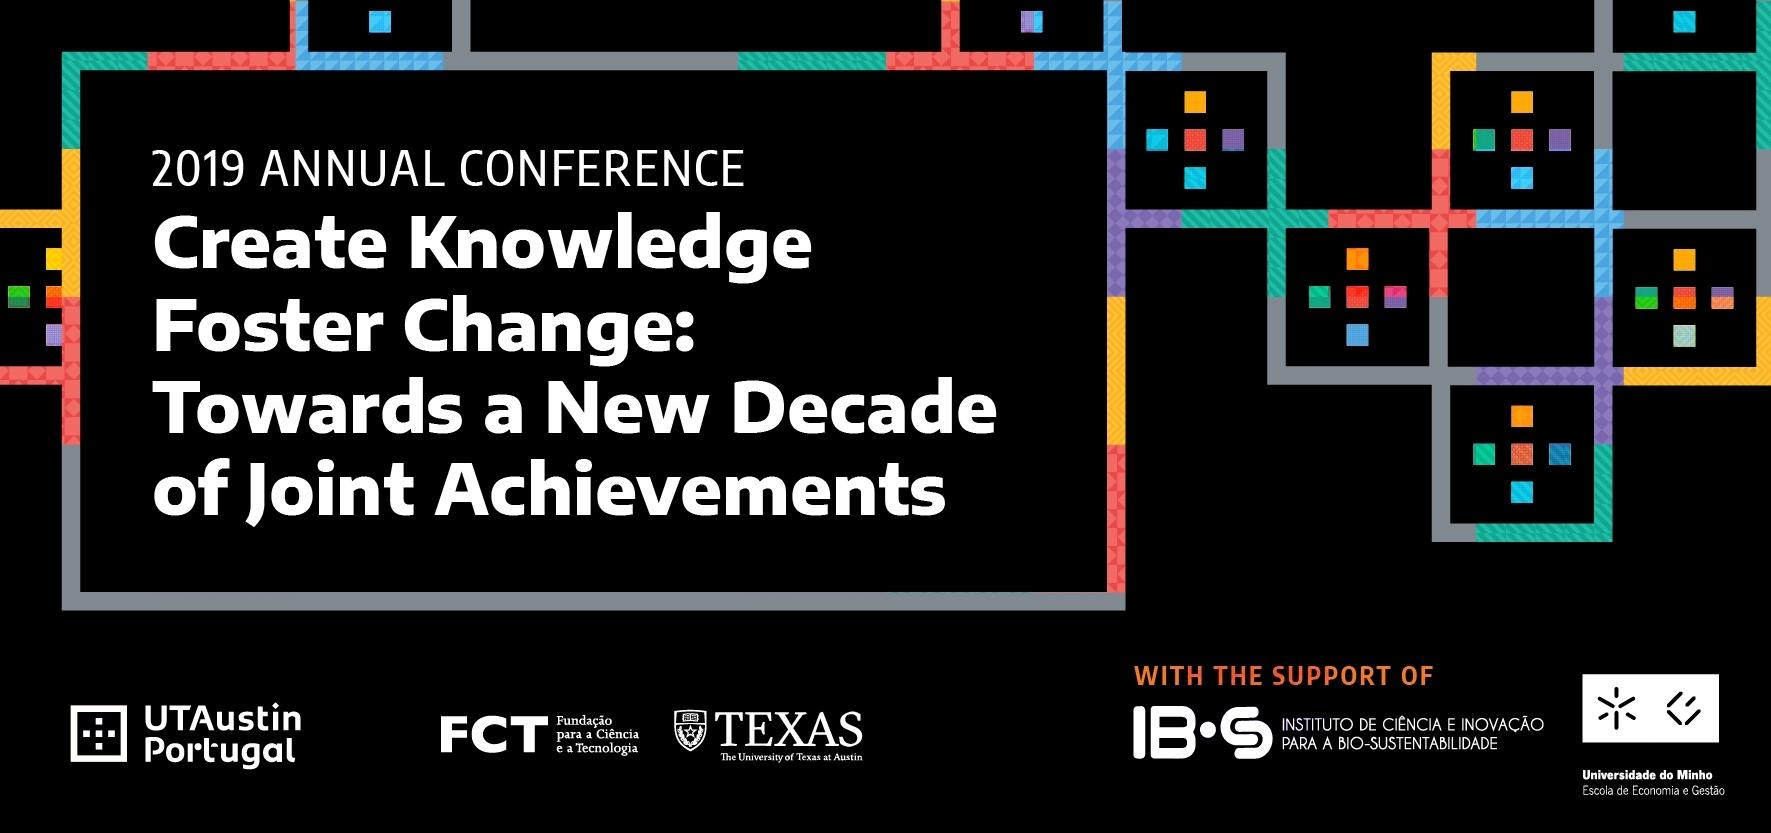 Ut Austin Portugal Program Conference – Create Knowledge